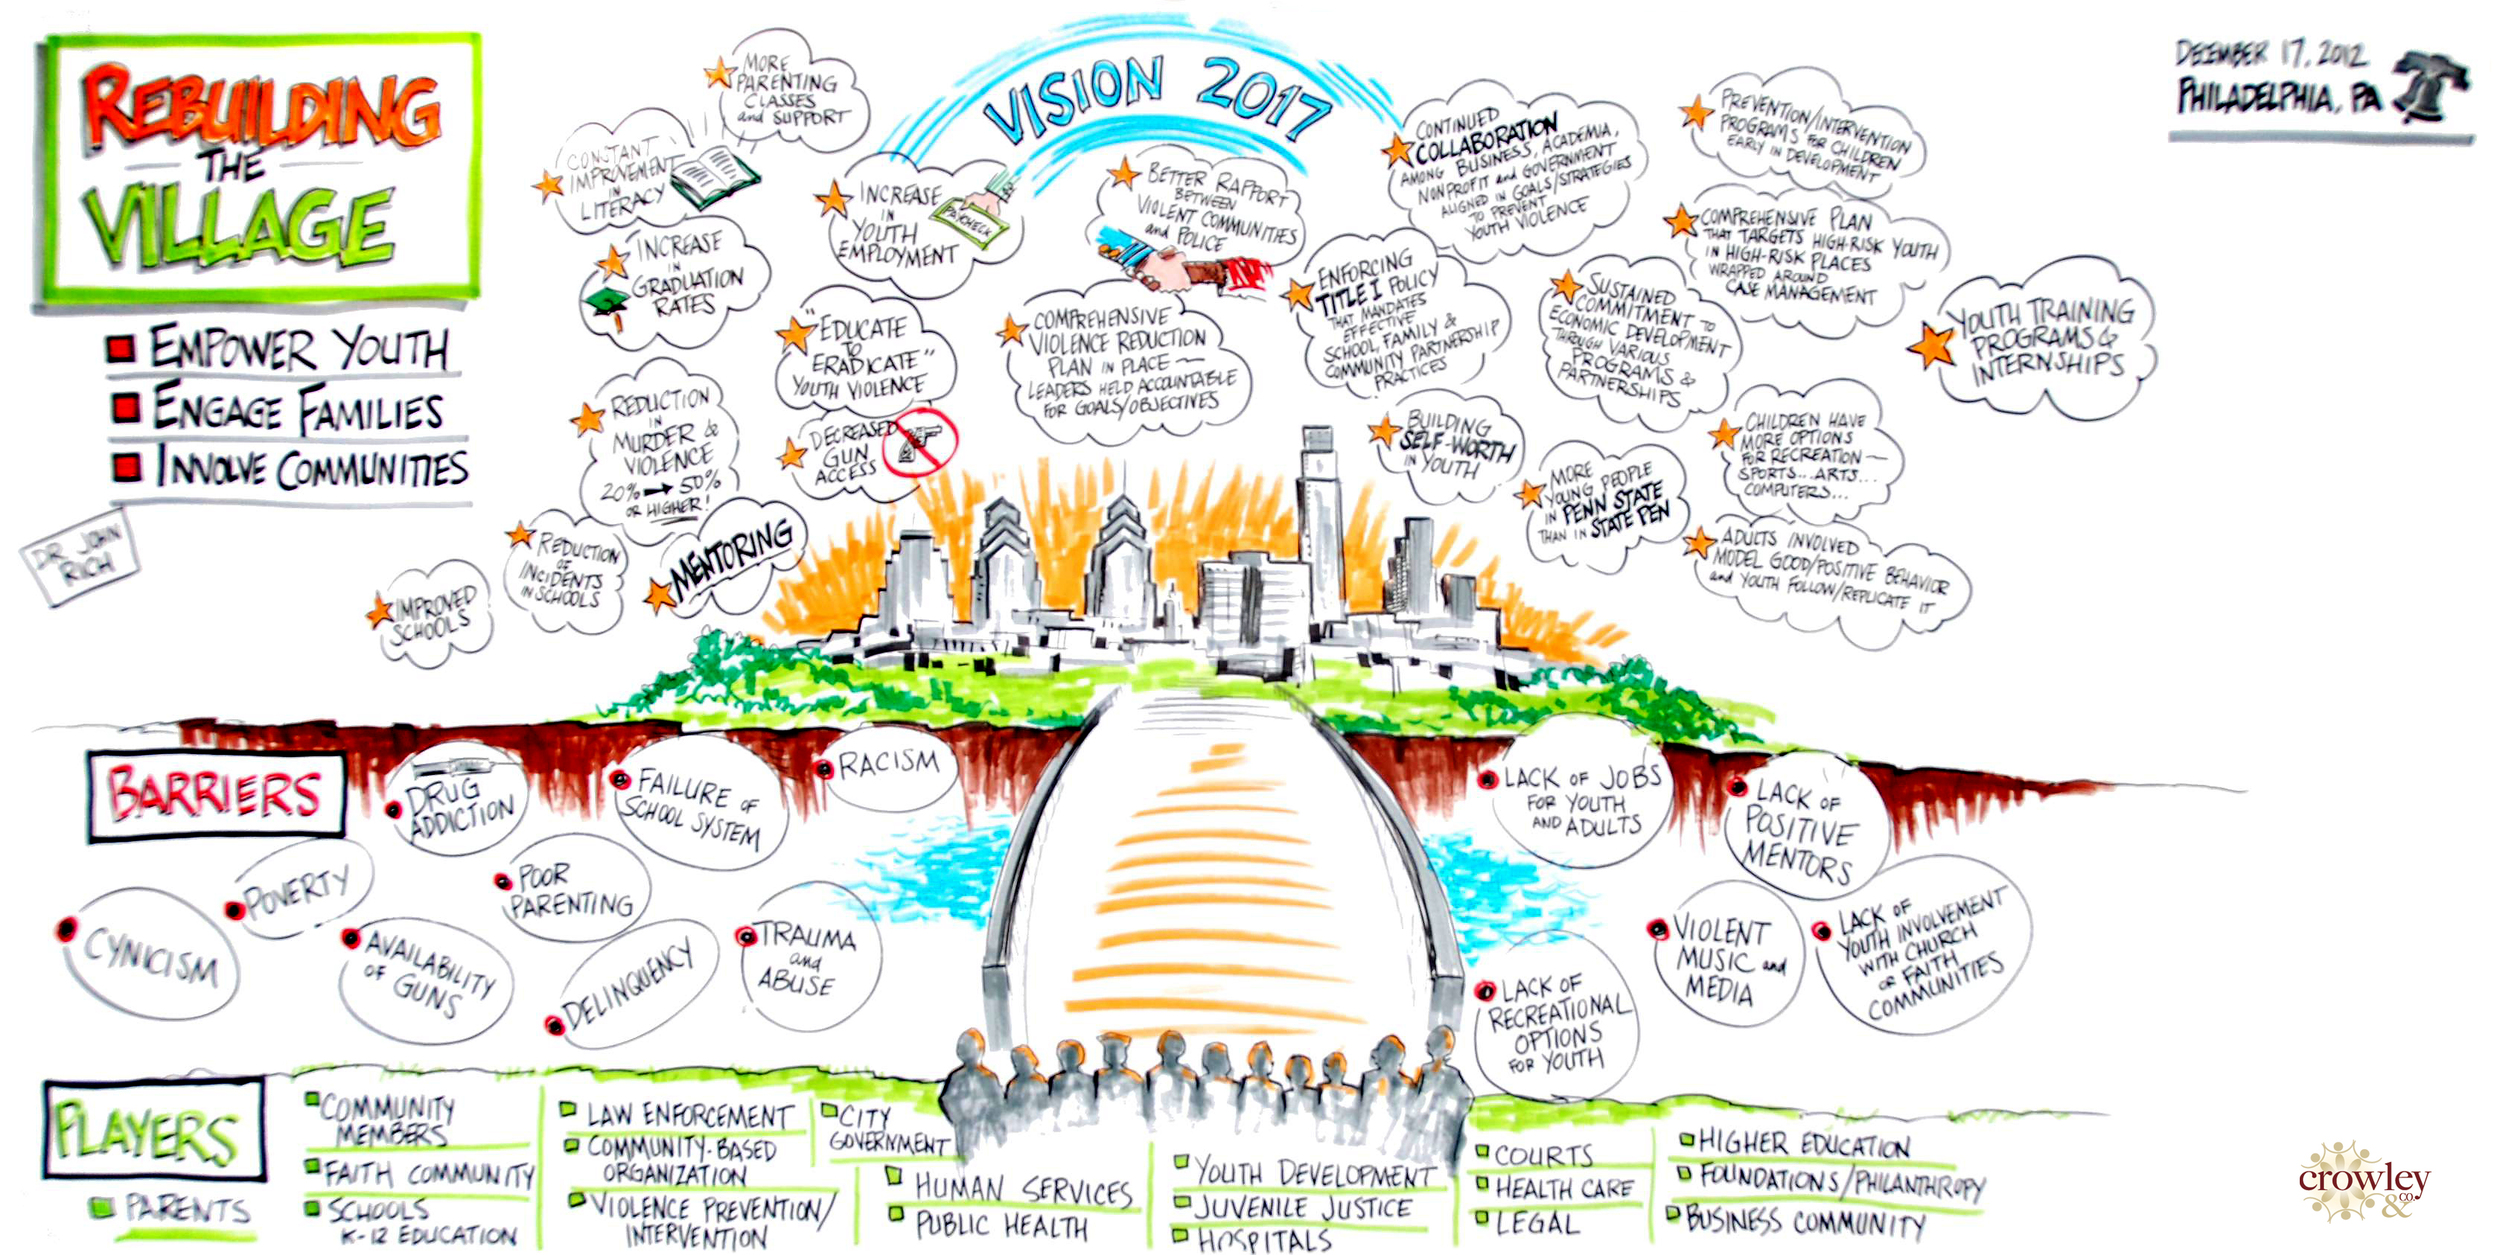 Philadelphia+-+Rebuilding+the+Village+Vision+1-Chart.jpg